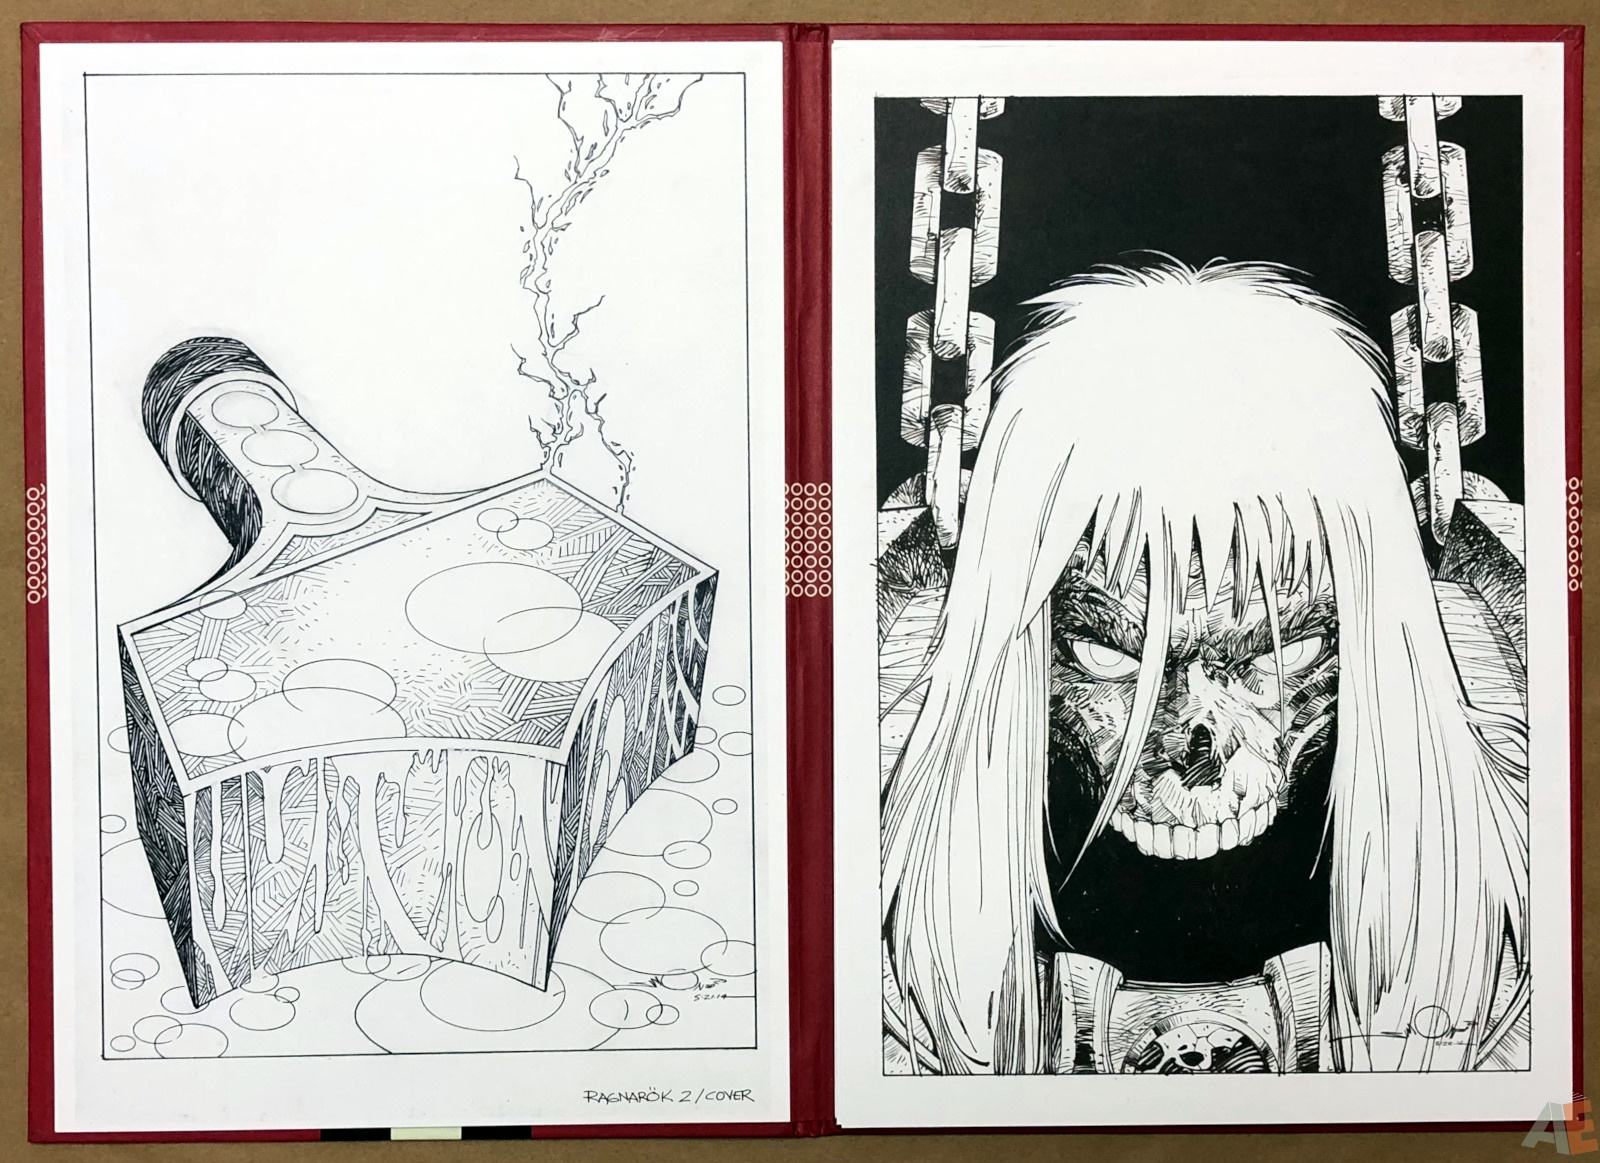 Walter Simonson's Ragnarök Artist's Edition Portfolio 8